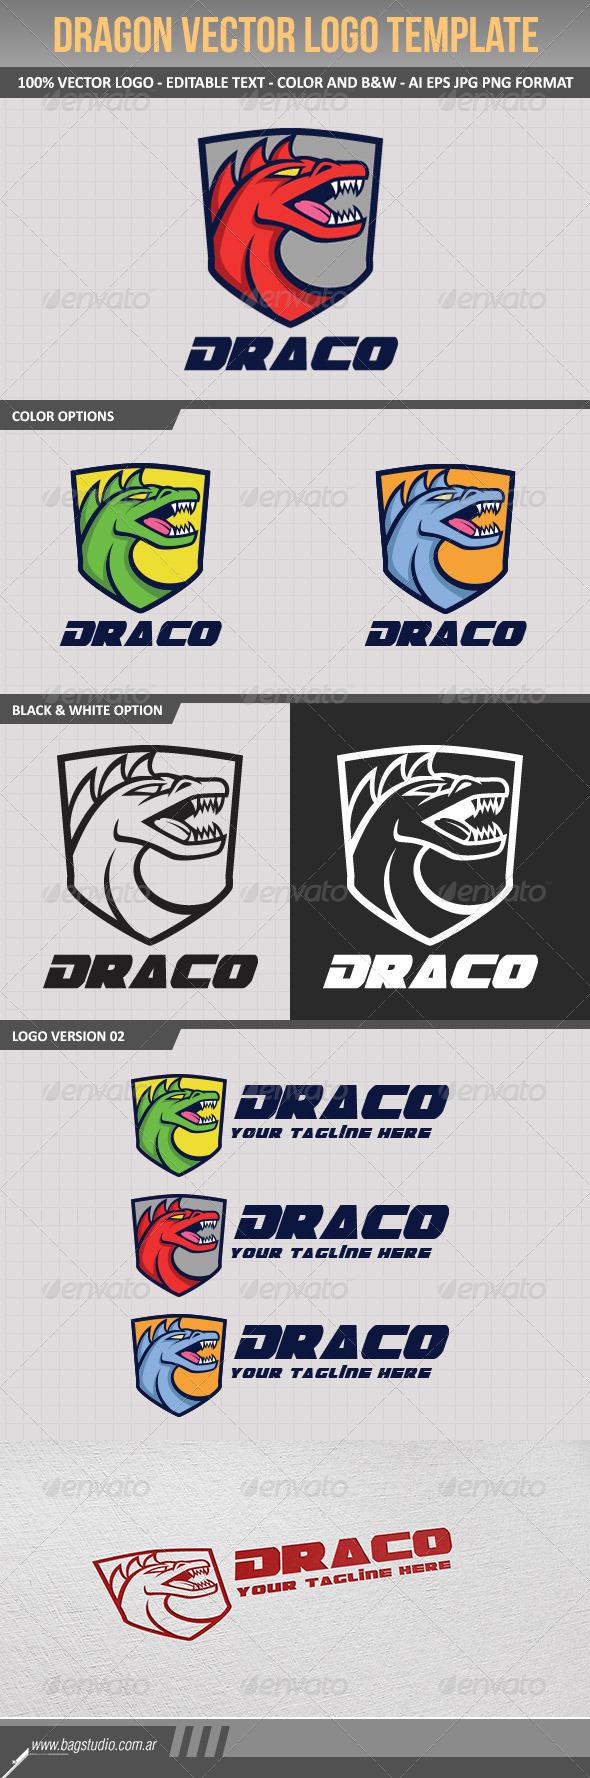 GraphicRiver Dragon Vector Logo Template 7835795